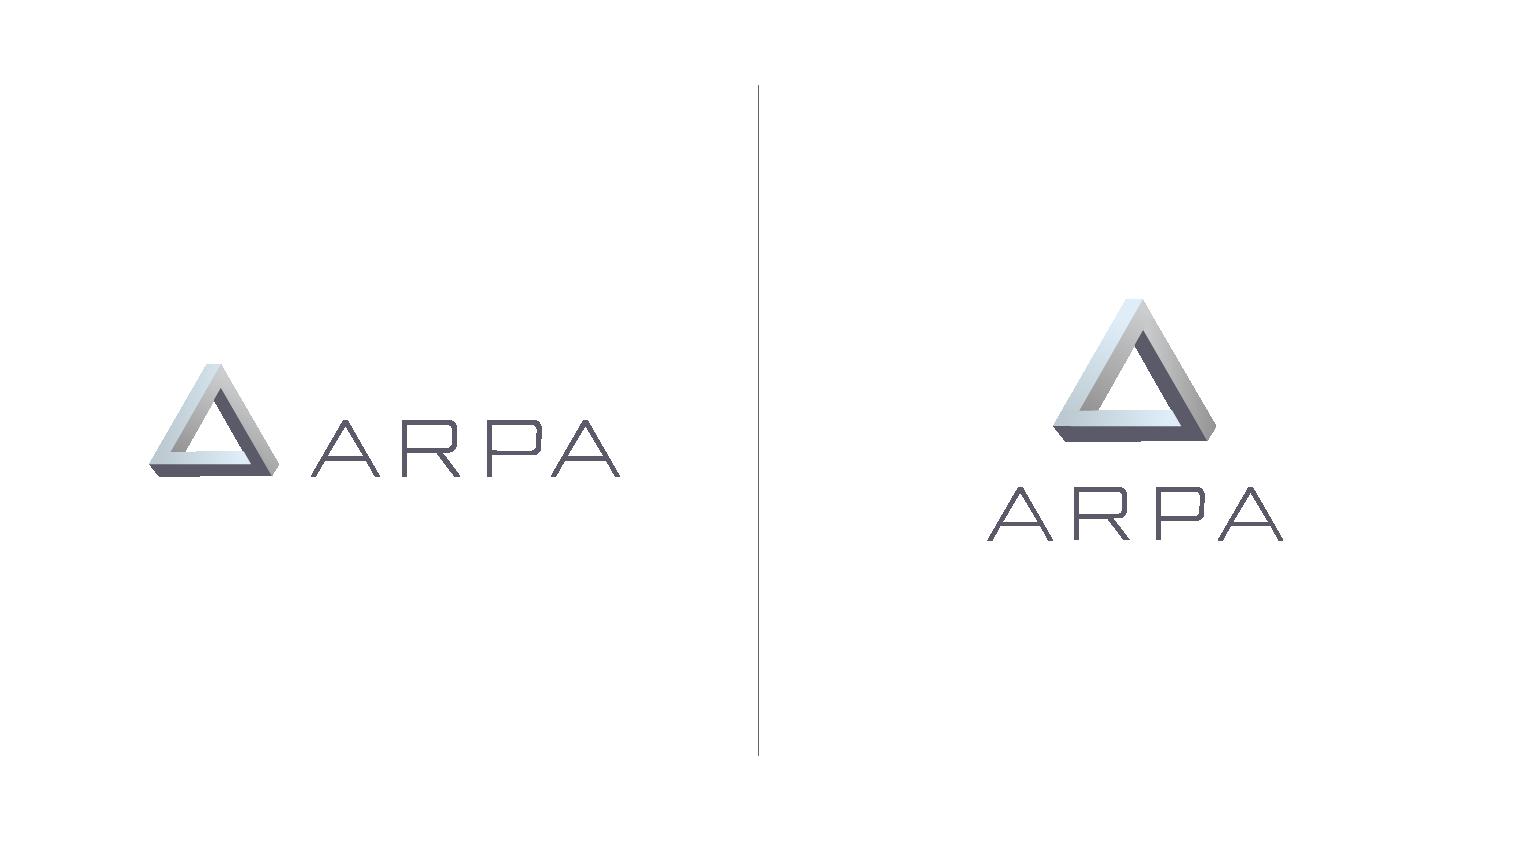 ARPA_logo-horizontal-vertical-perspection-24